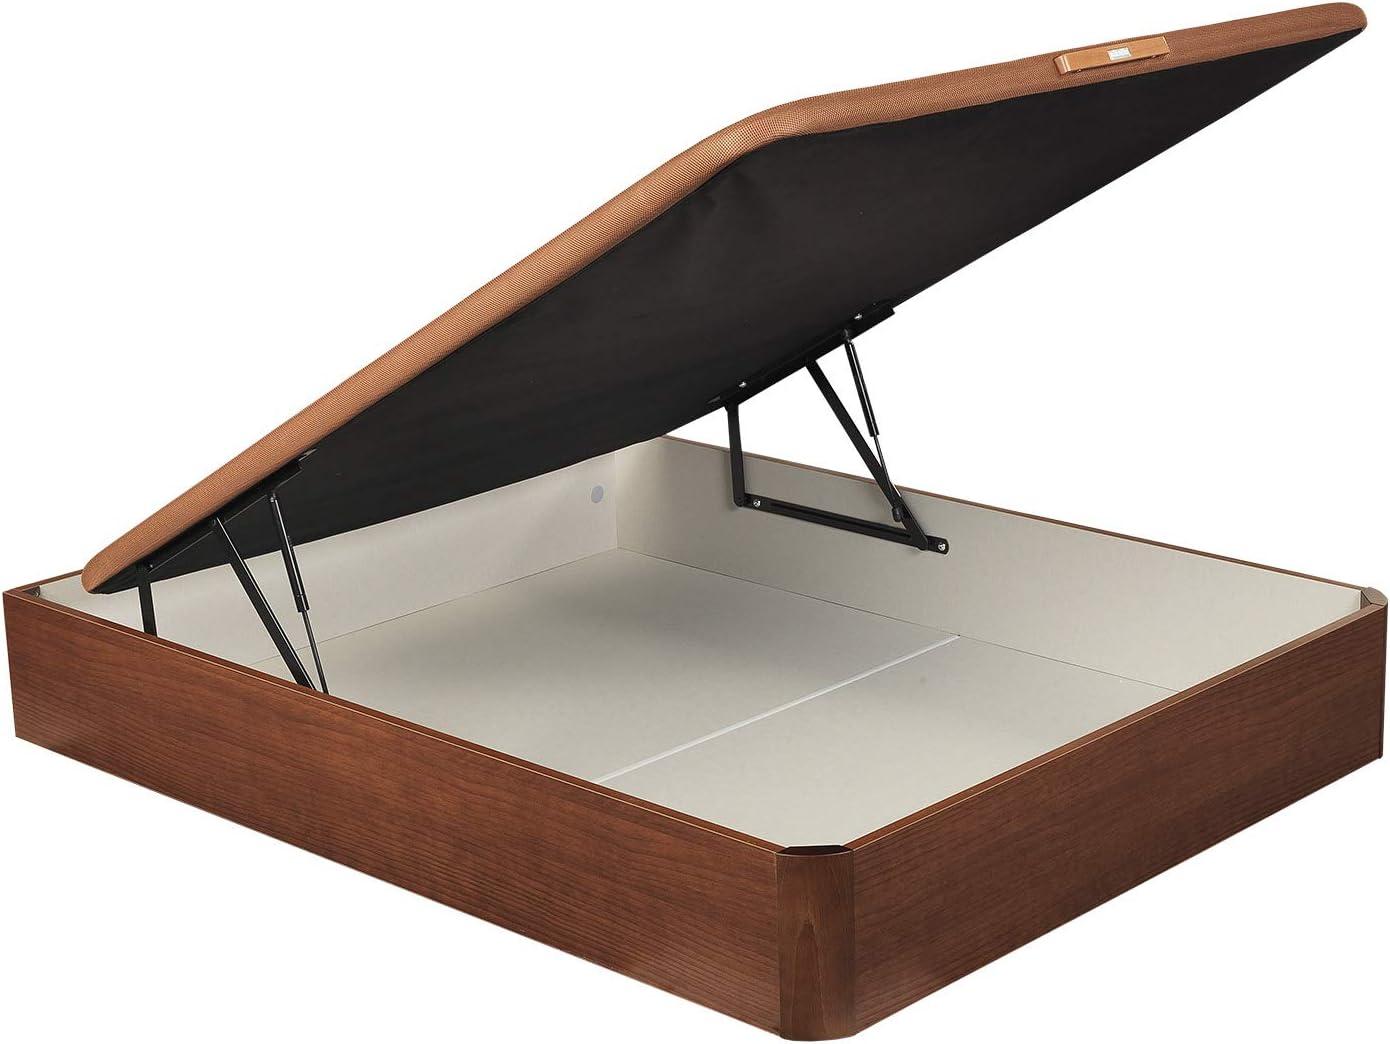 PIKOLIN, canapé abatible de almacenaje Color Cerezo 150x190, Servicio de Entrega Premium Incluido